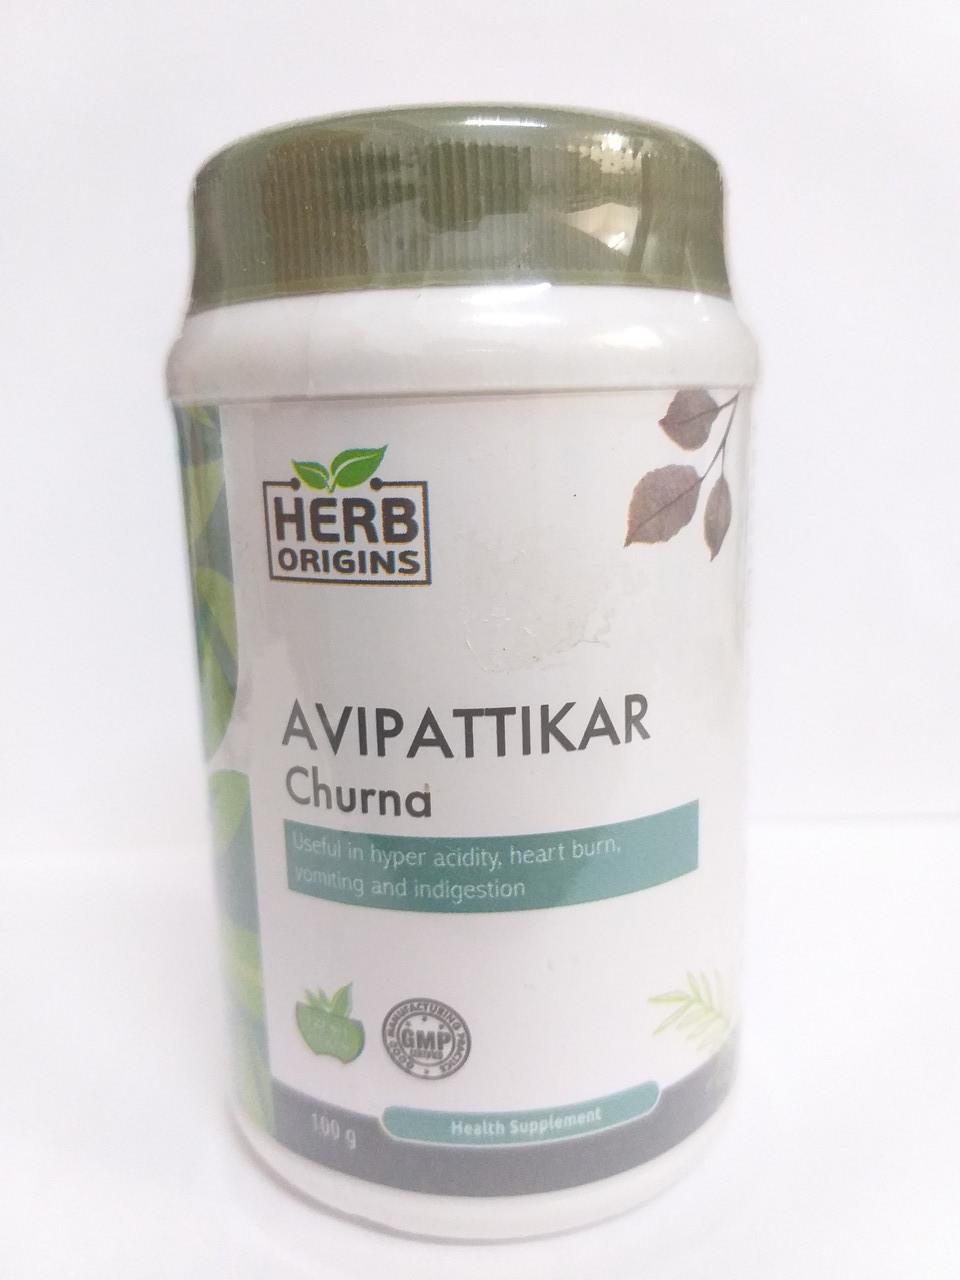 Авипаттикар чурна, 100 гр, Herb Origins, от повышенной кислотнлсти